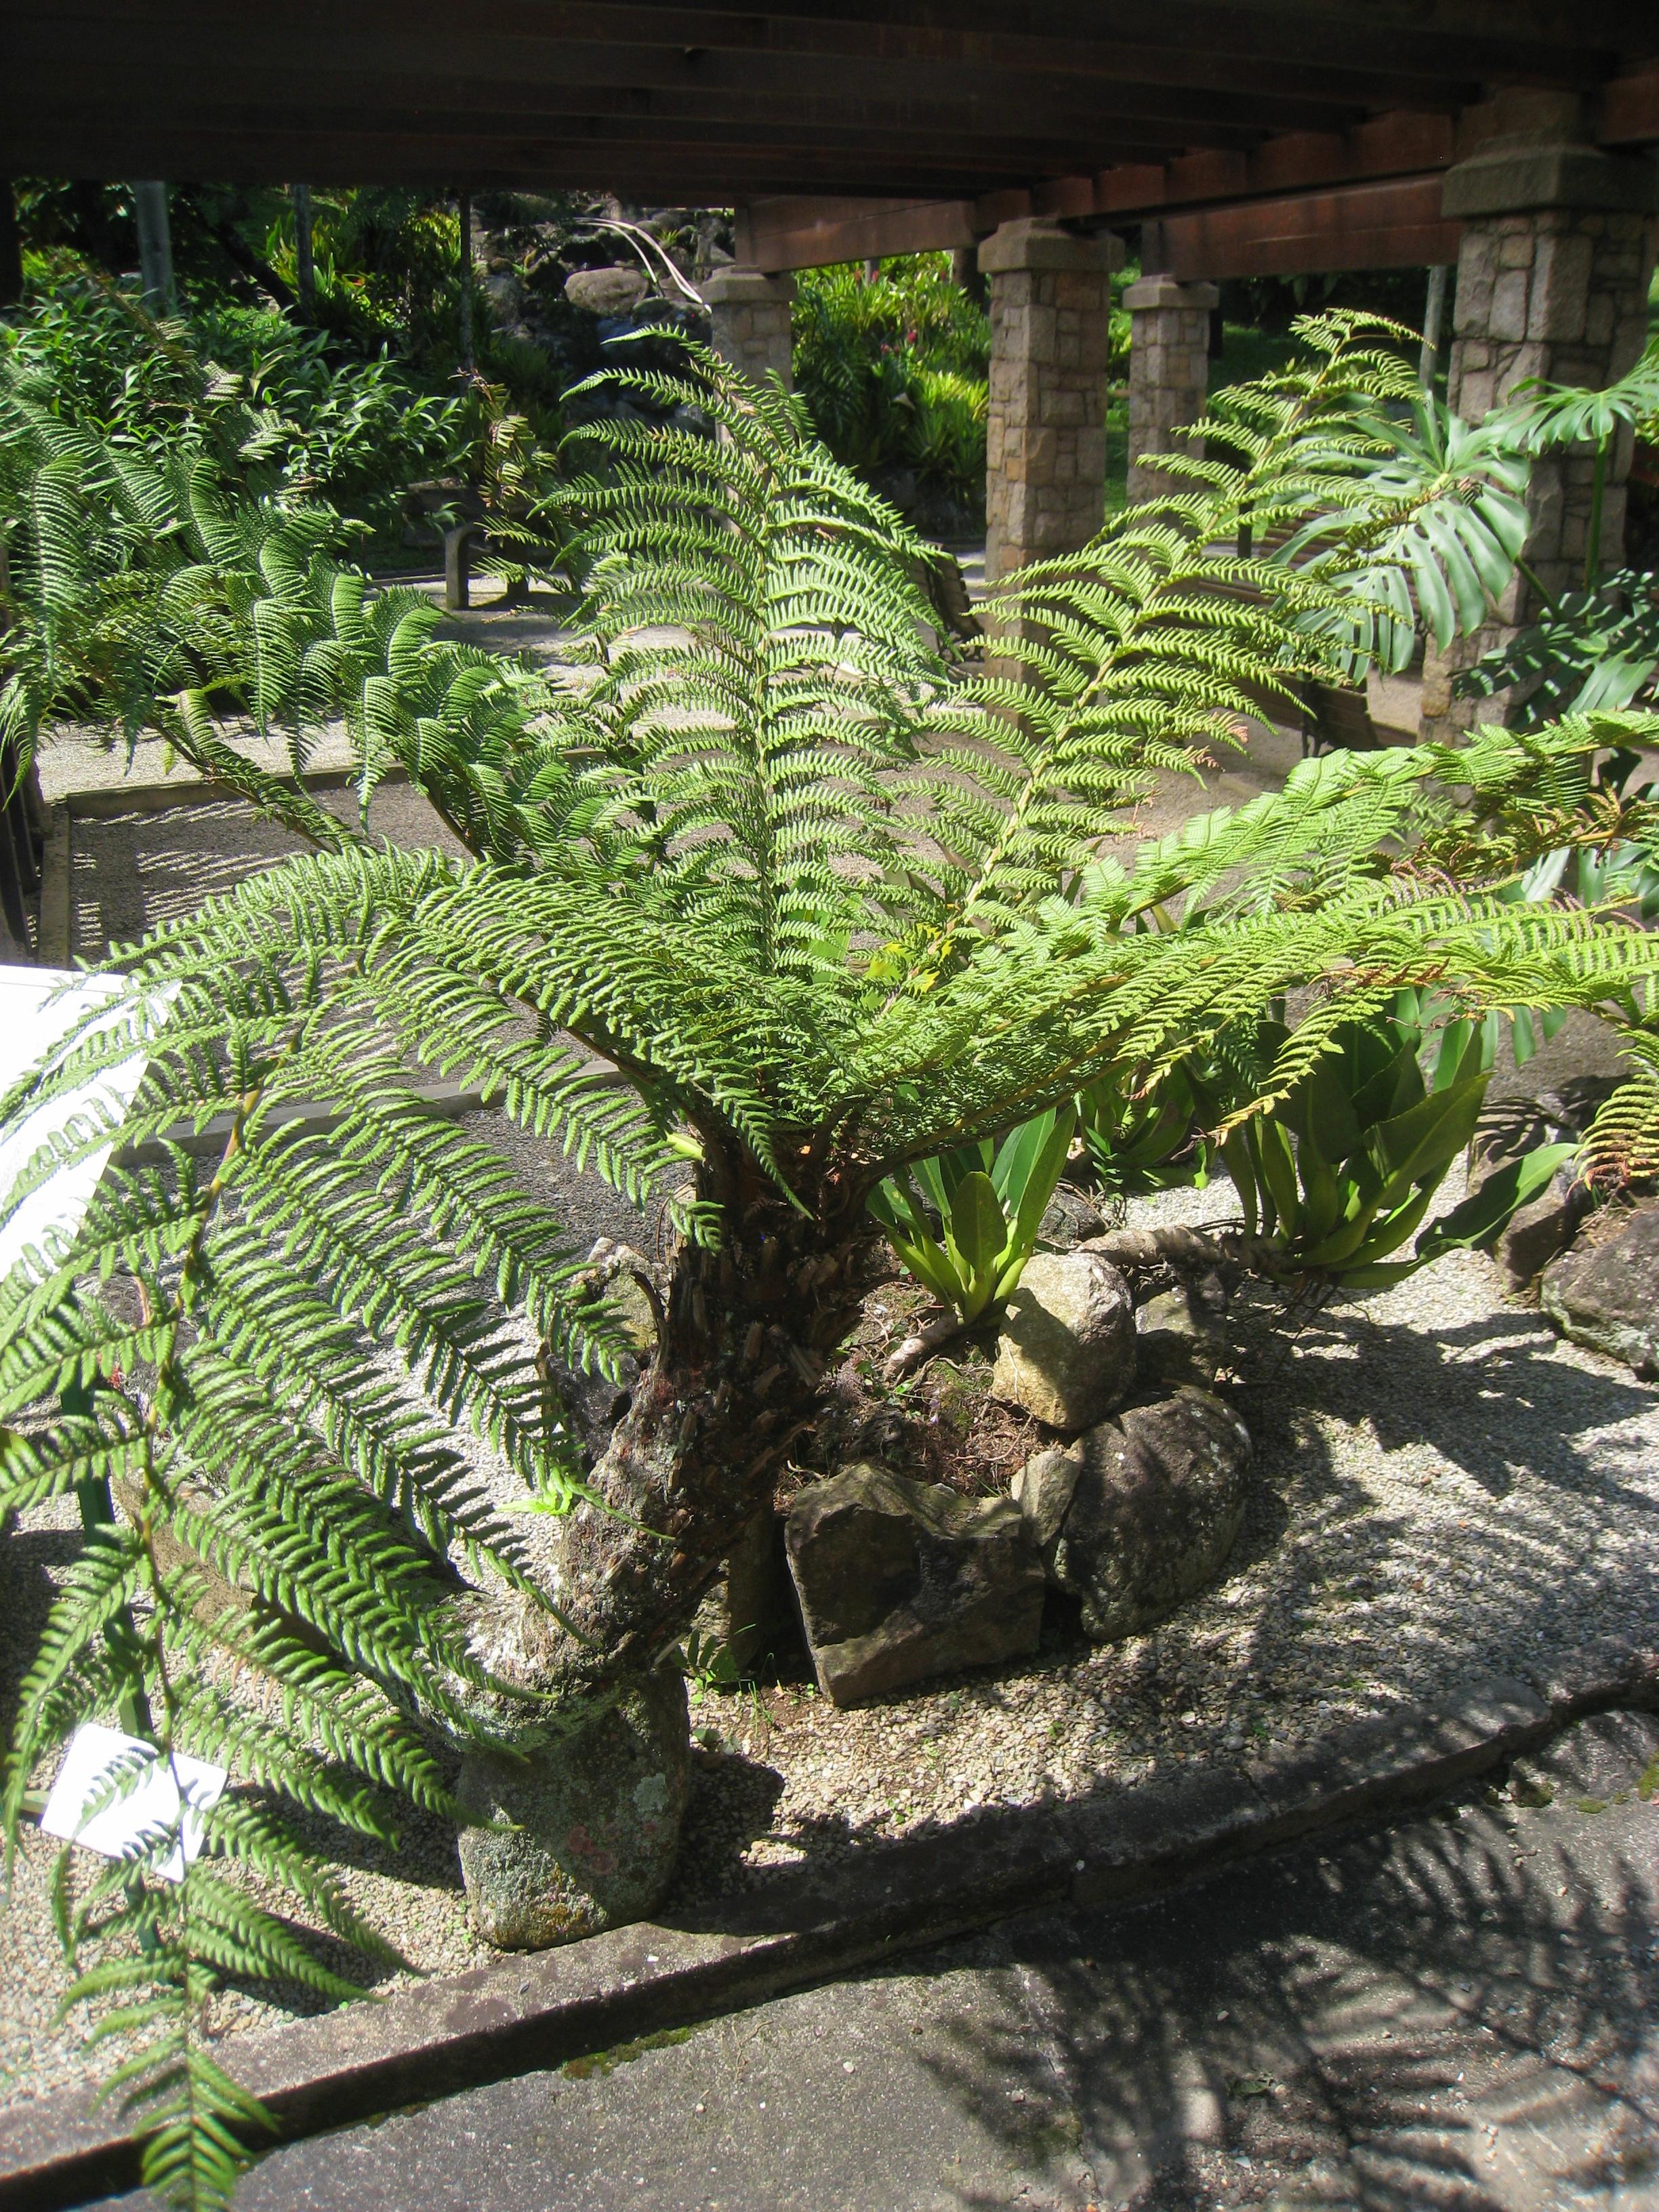 Dick in a plant creates futanaries 2